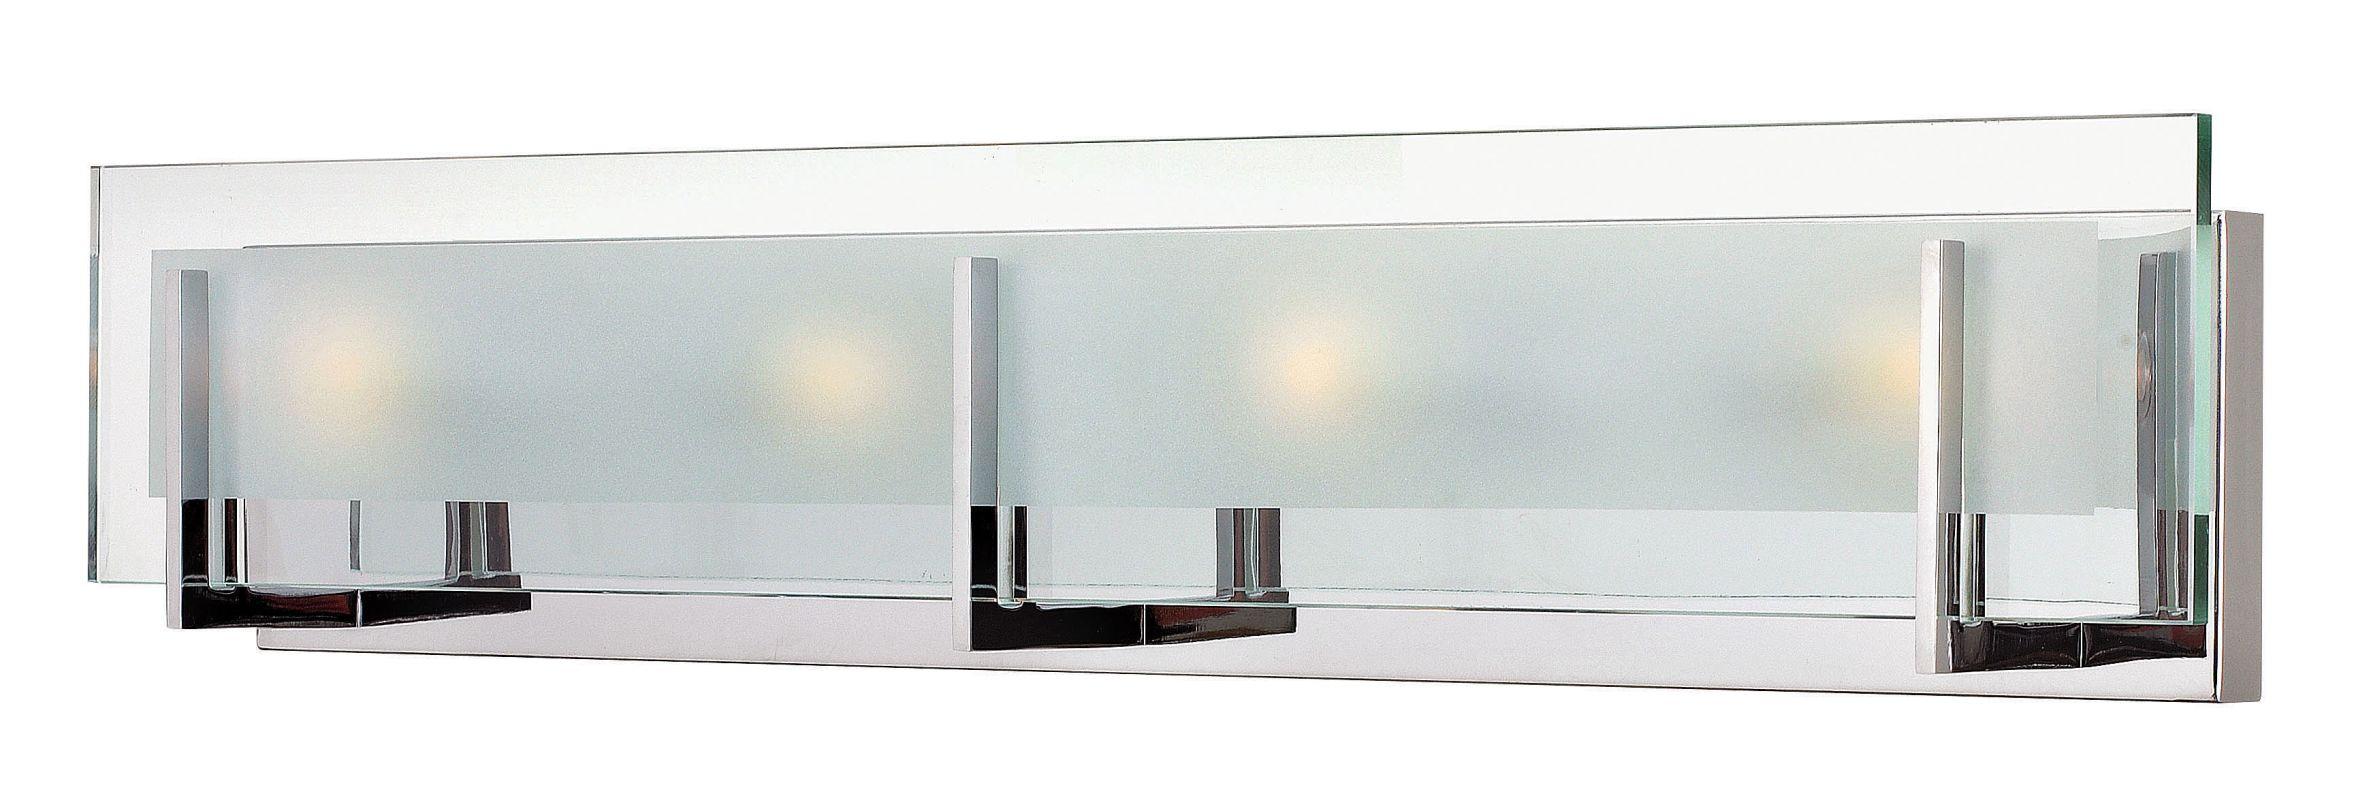 Hinkley 5654CM-LED2 Chrome Contemporary Latitude Bathroom Light